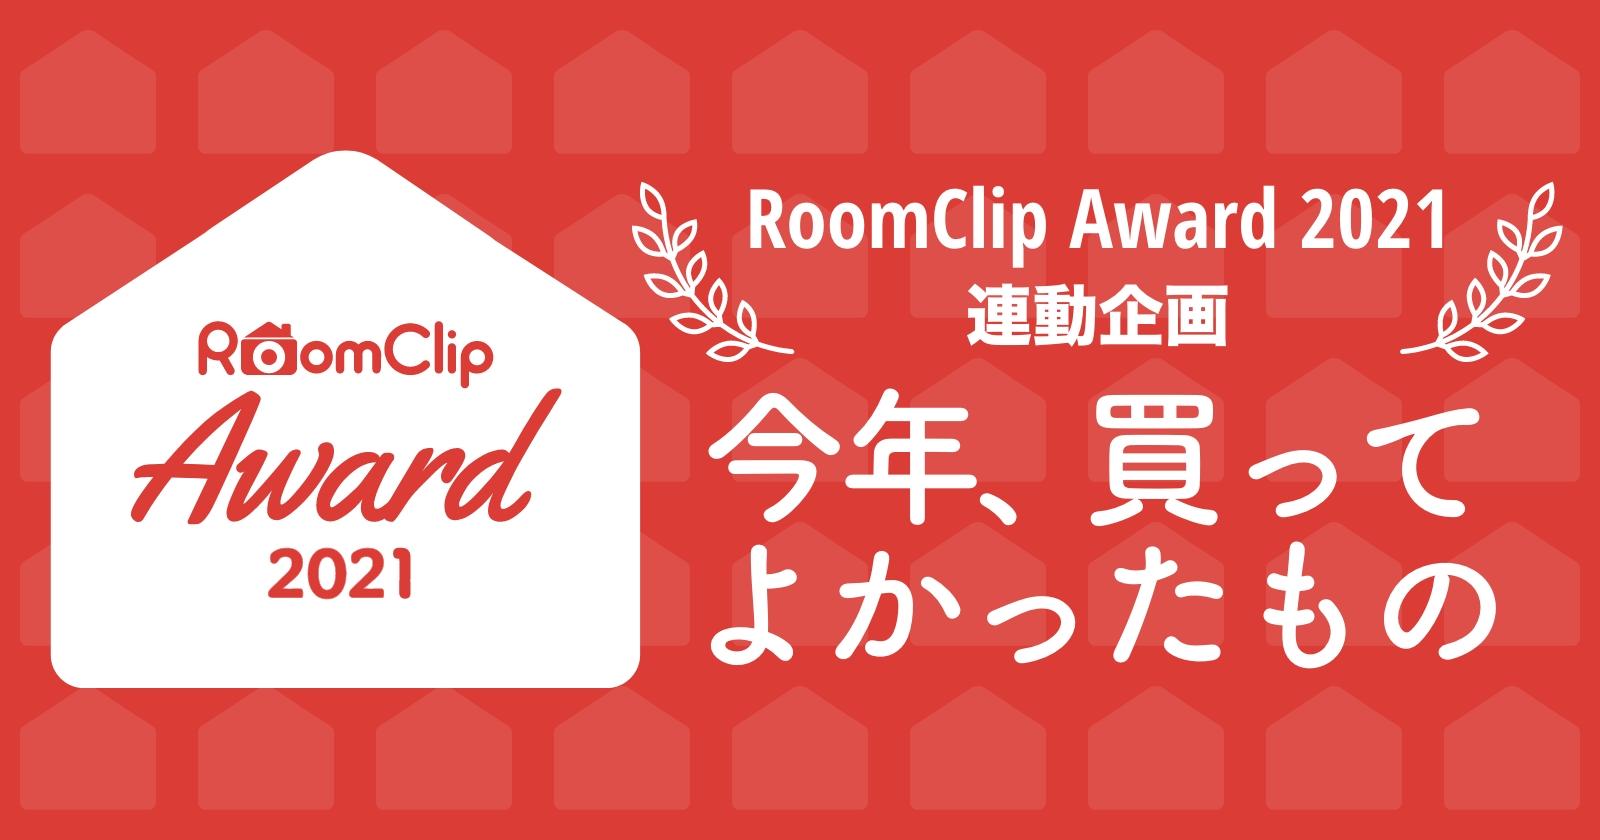 RoomClip Award 2021 連動企画「今年、買ってよかったもの」